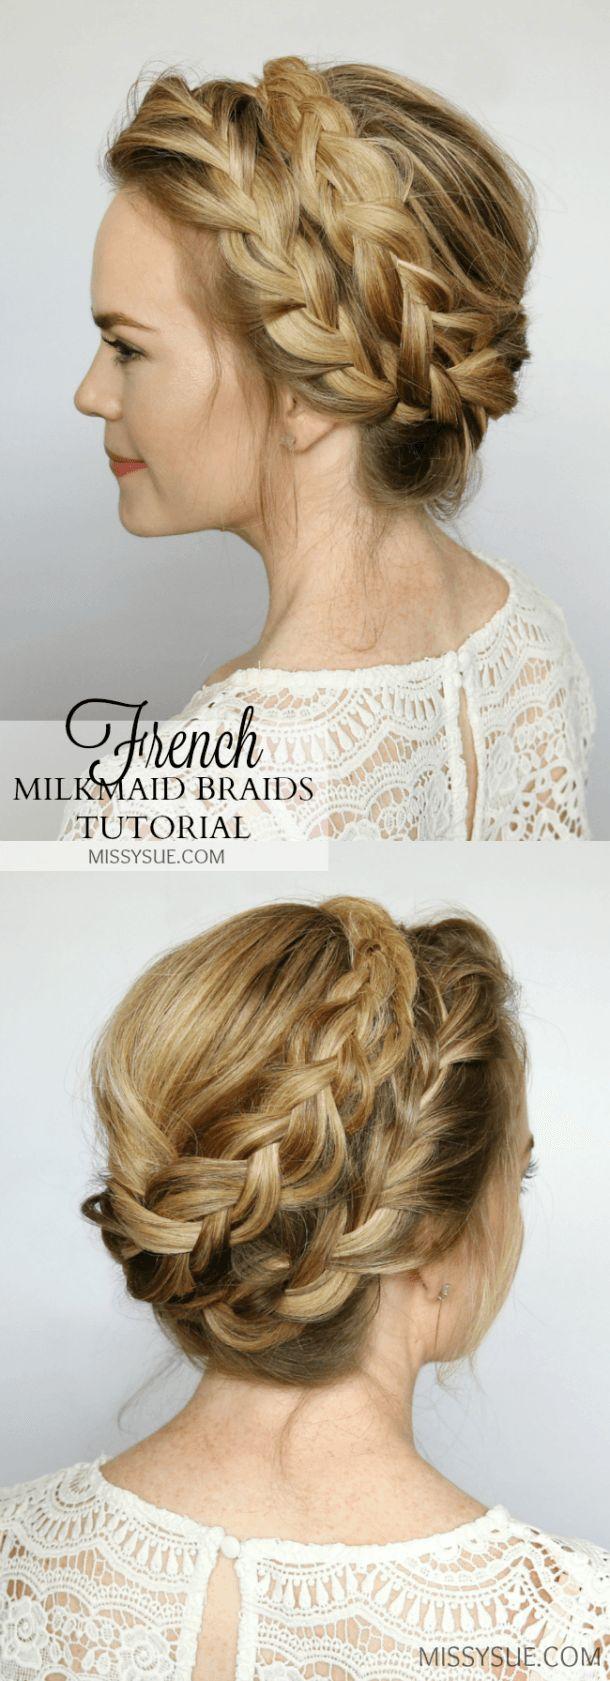 French milkmaid braids updo hair tutorial